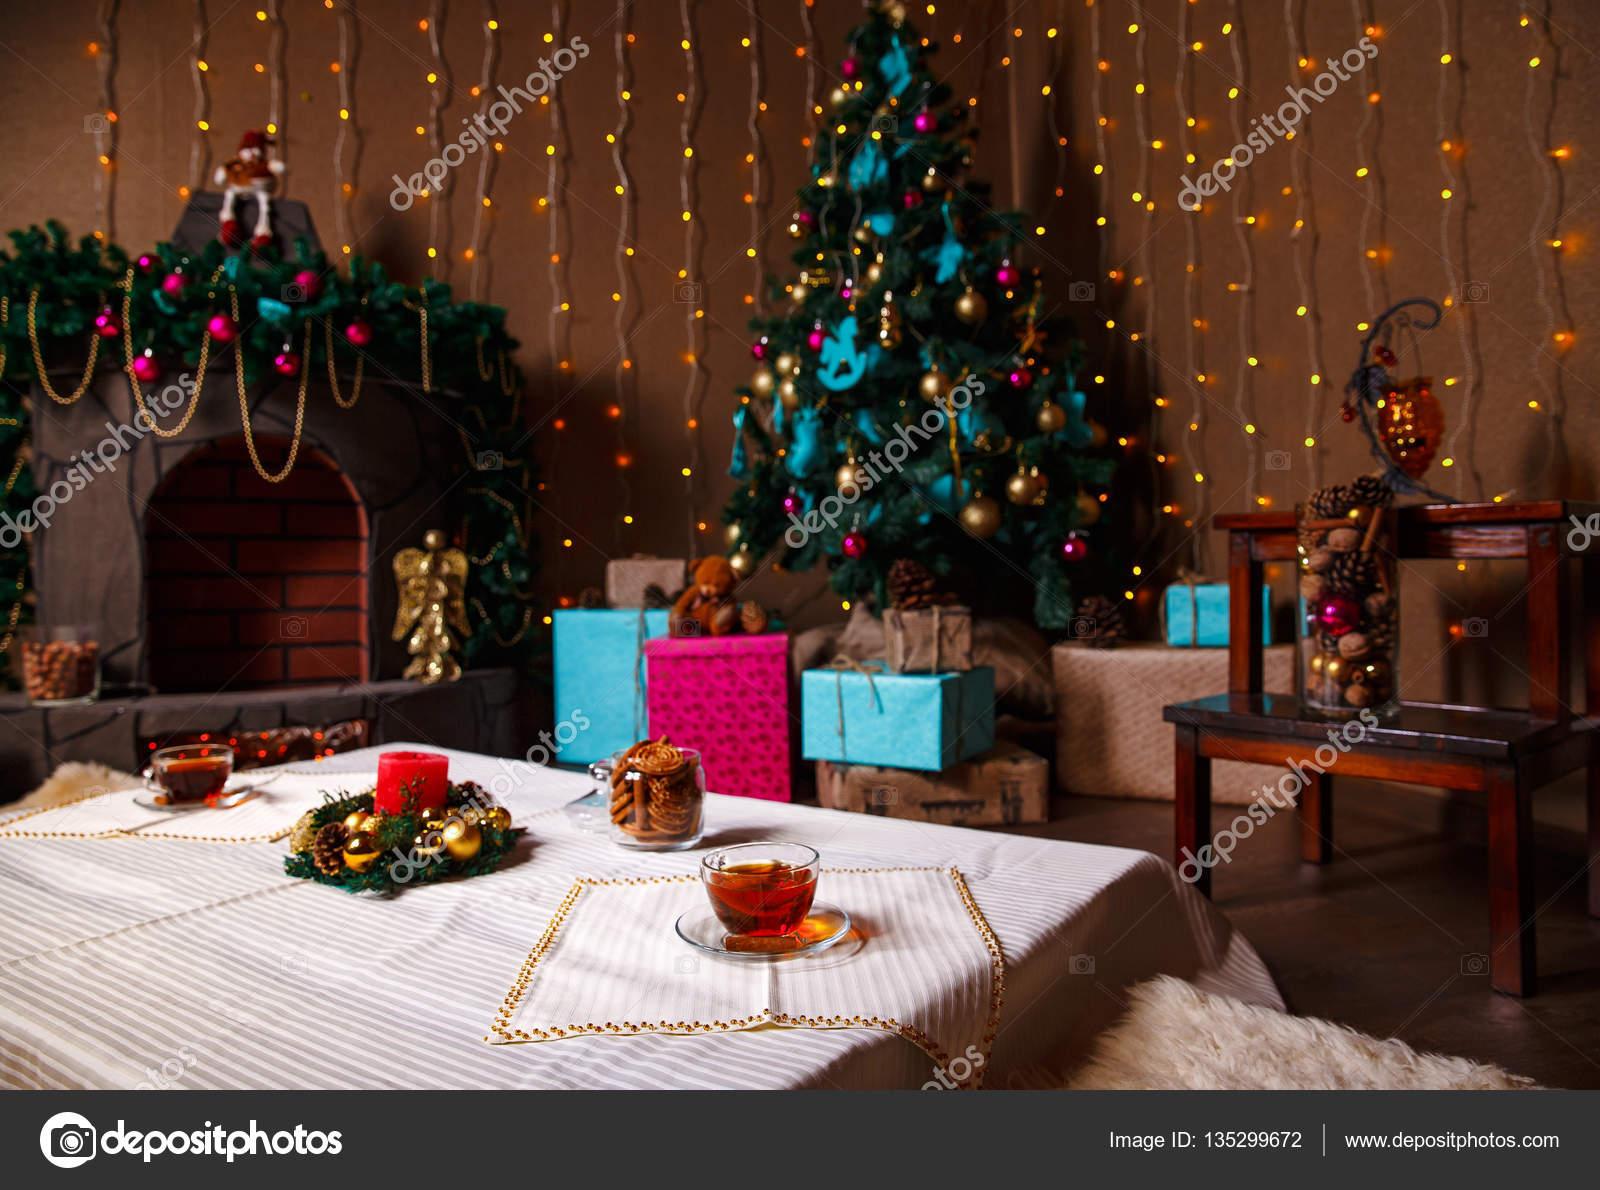 https://st3.depositphotos.com/5311026/13529/i/1600/depositphotos_135299672-stockafbeelding-kerstmis-kamer-interieur-design-kerstboom.jpg